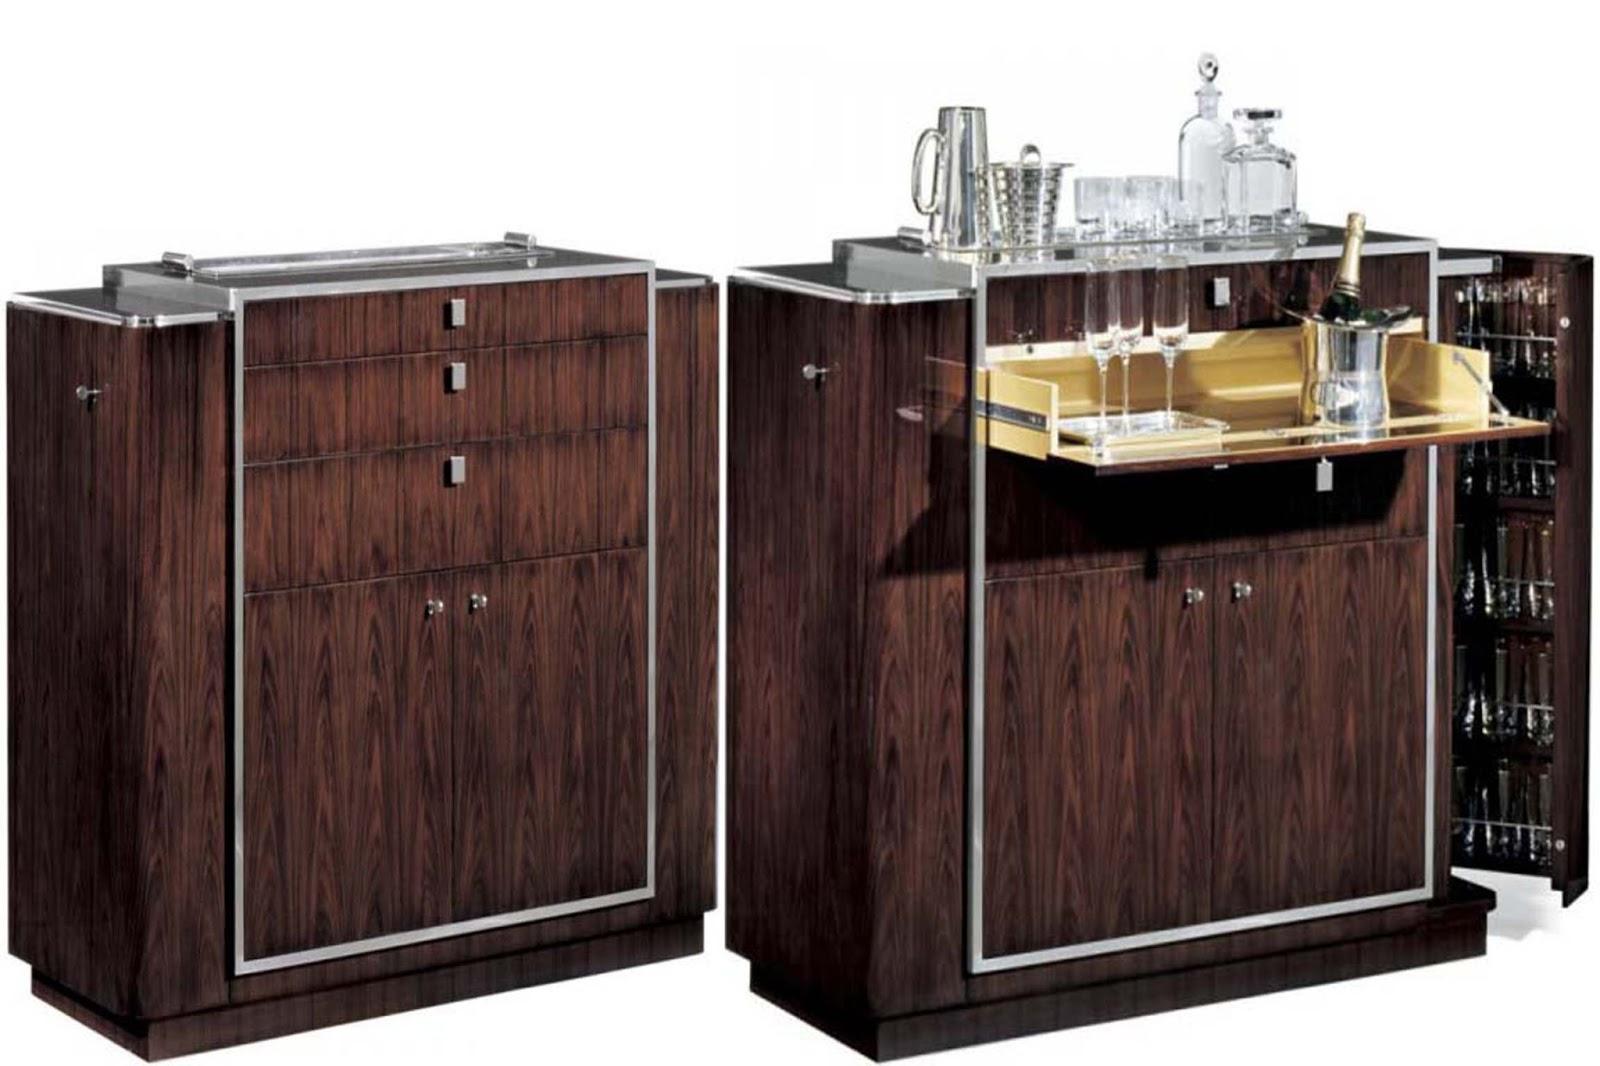 Ralph laurent y su nuevo mueble bar duke - Mueble bar moderno ...